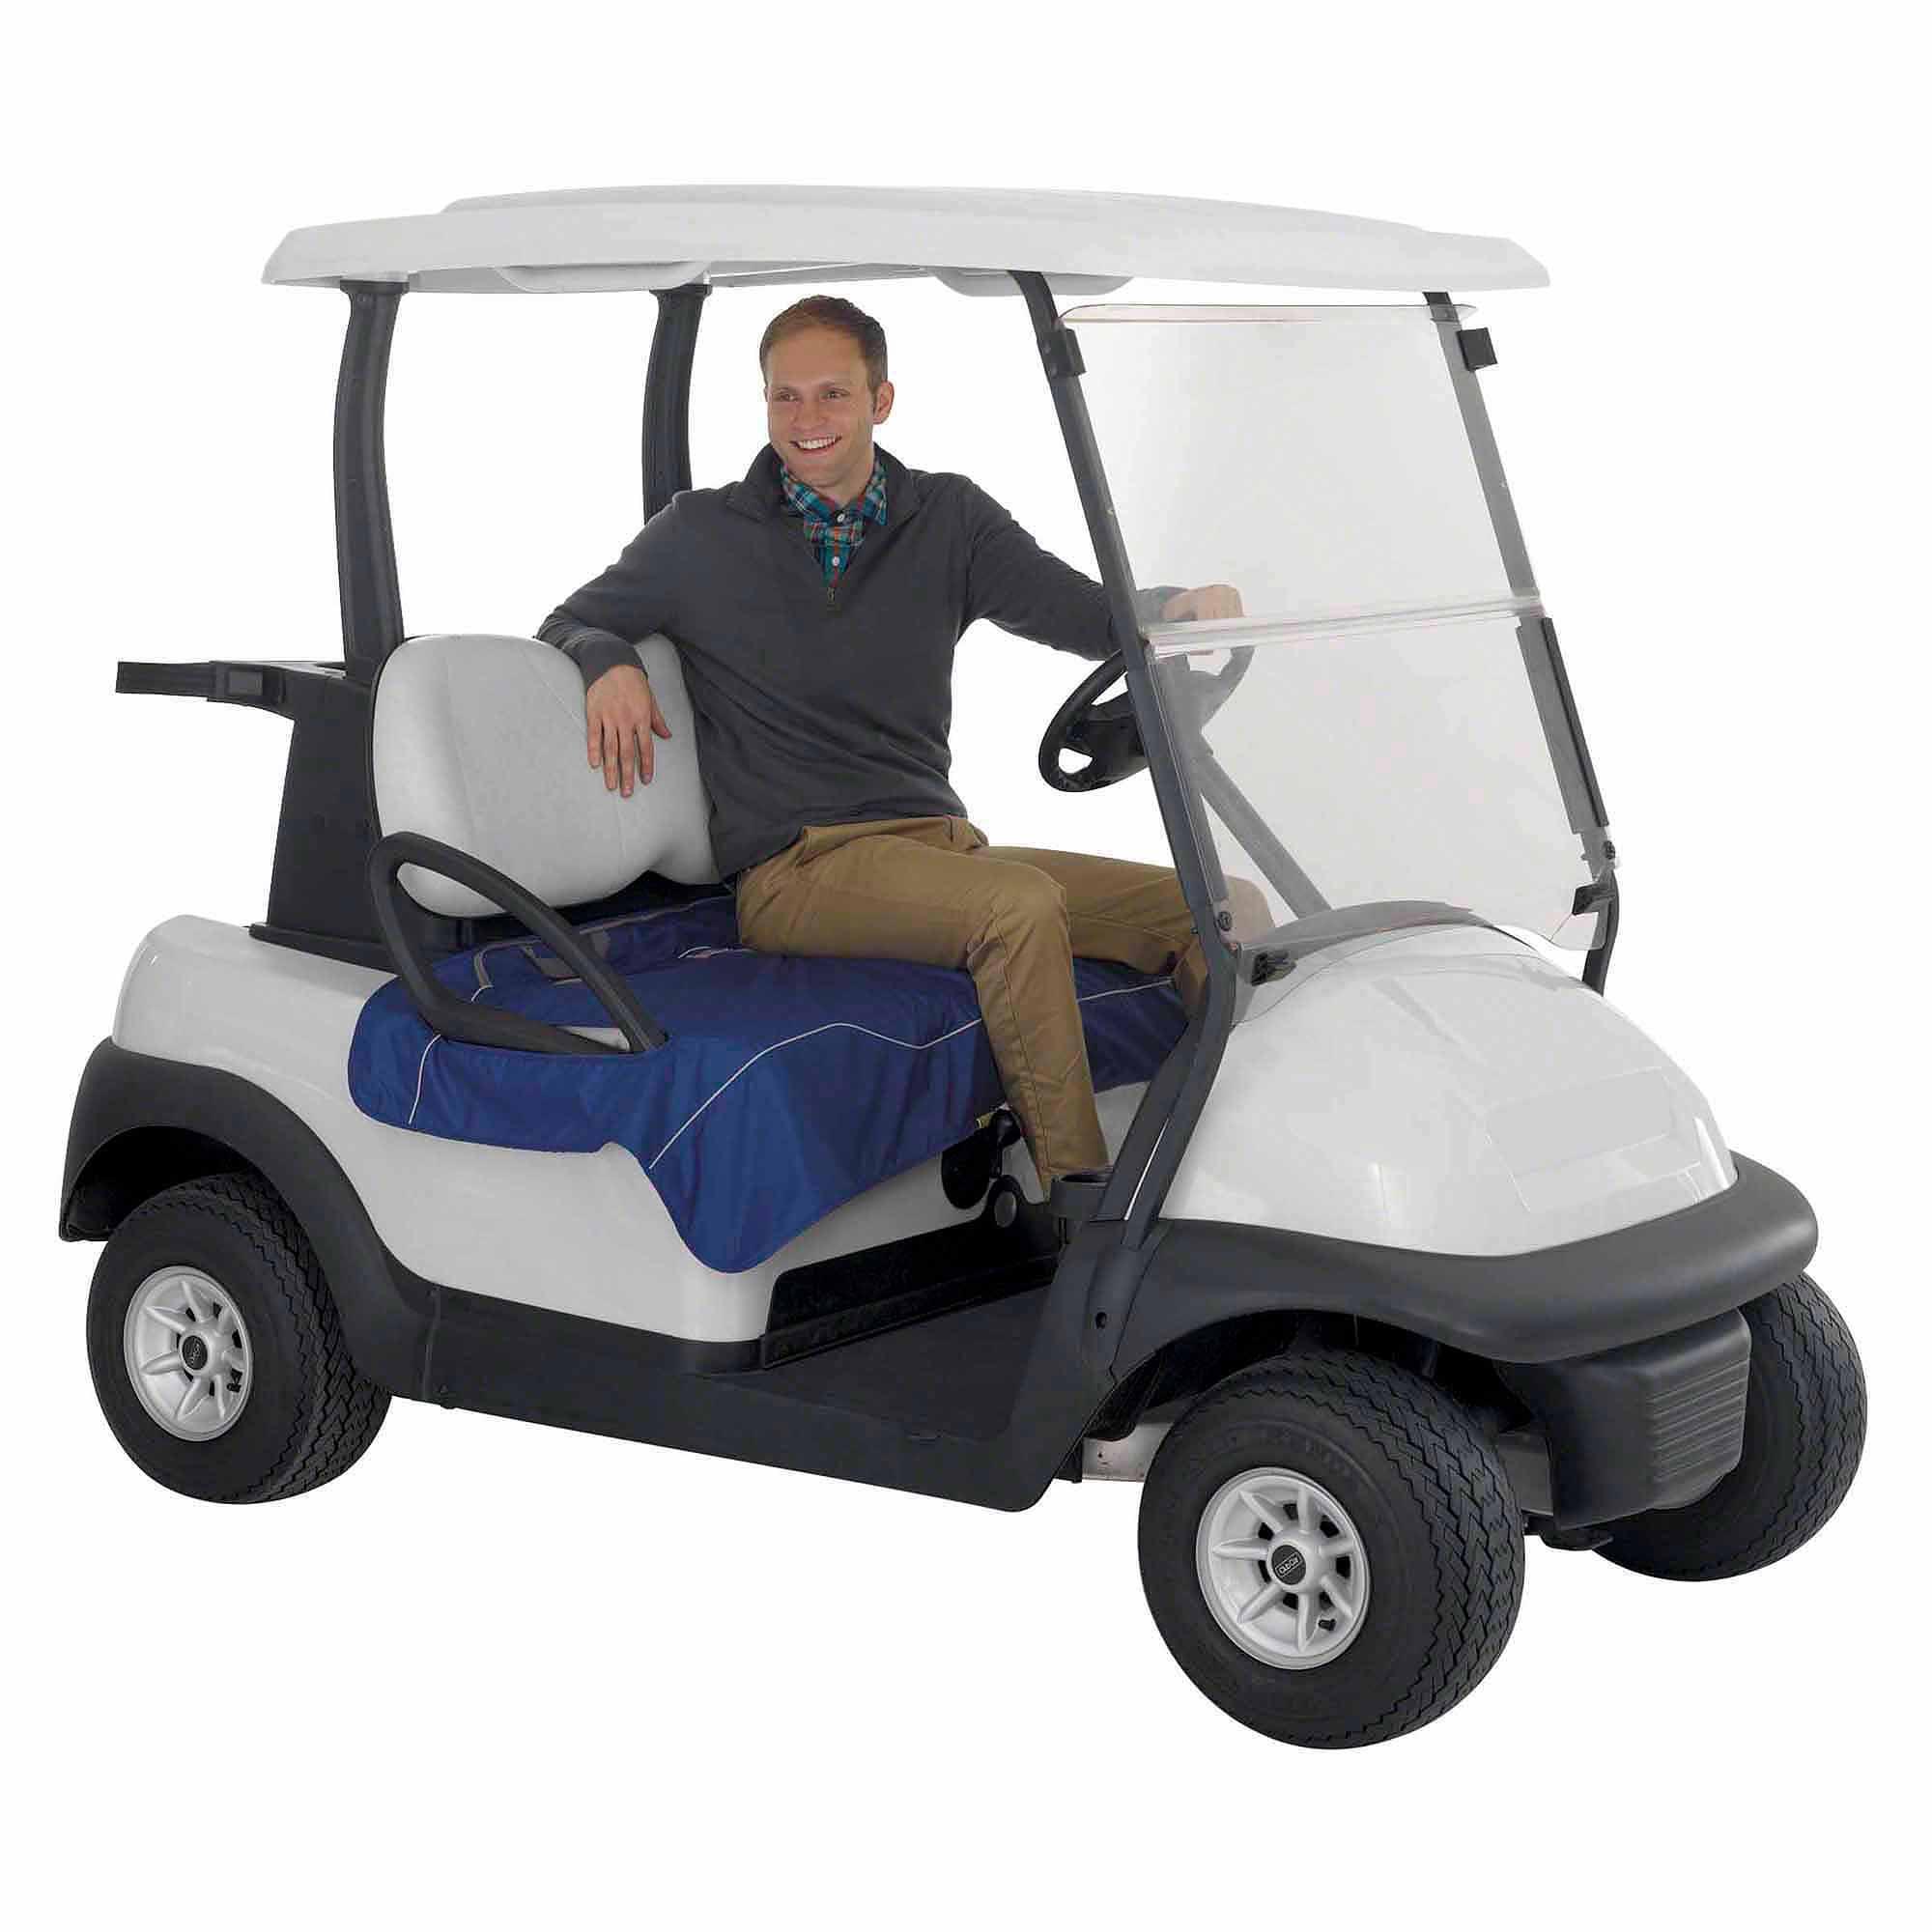 hight resolution of classic accessories fairway golf cart seat blanket 32 x 54 walmart com